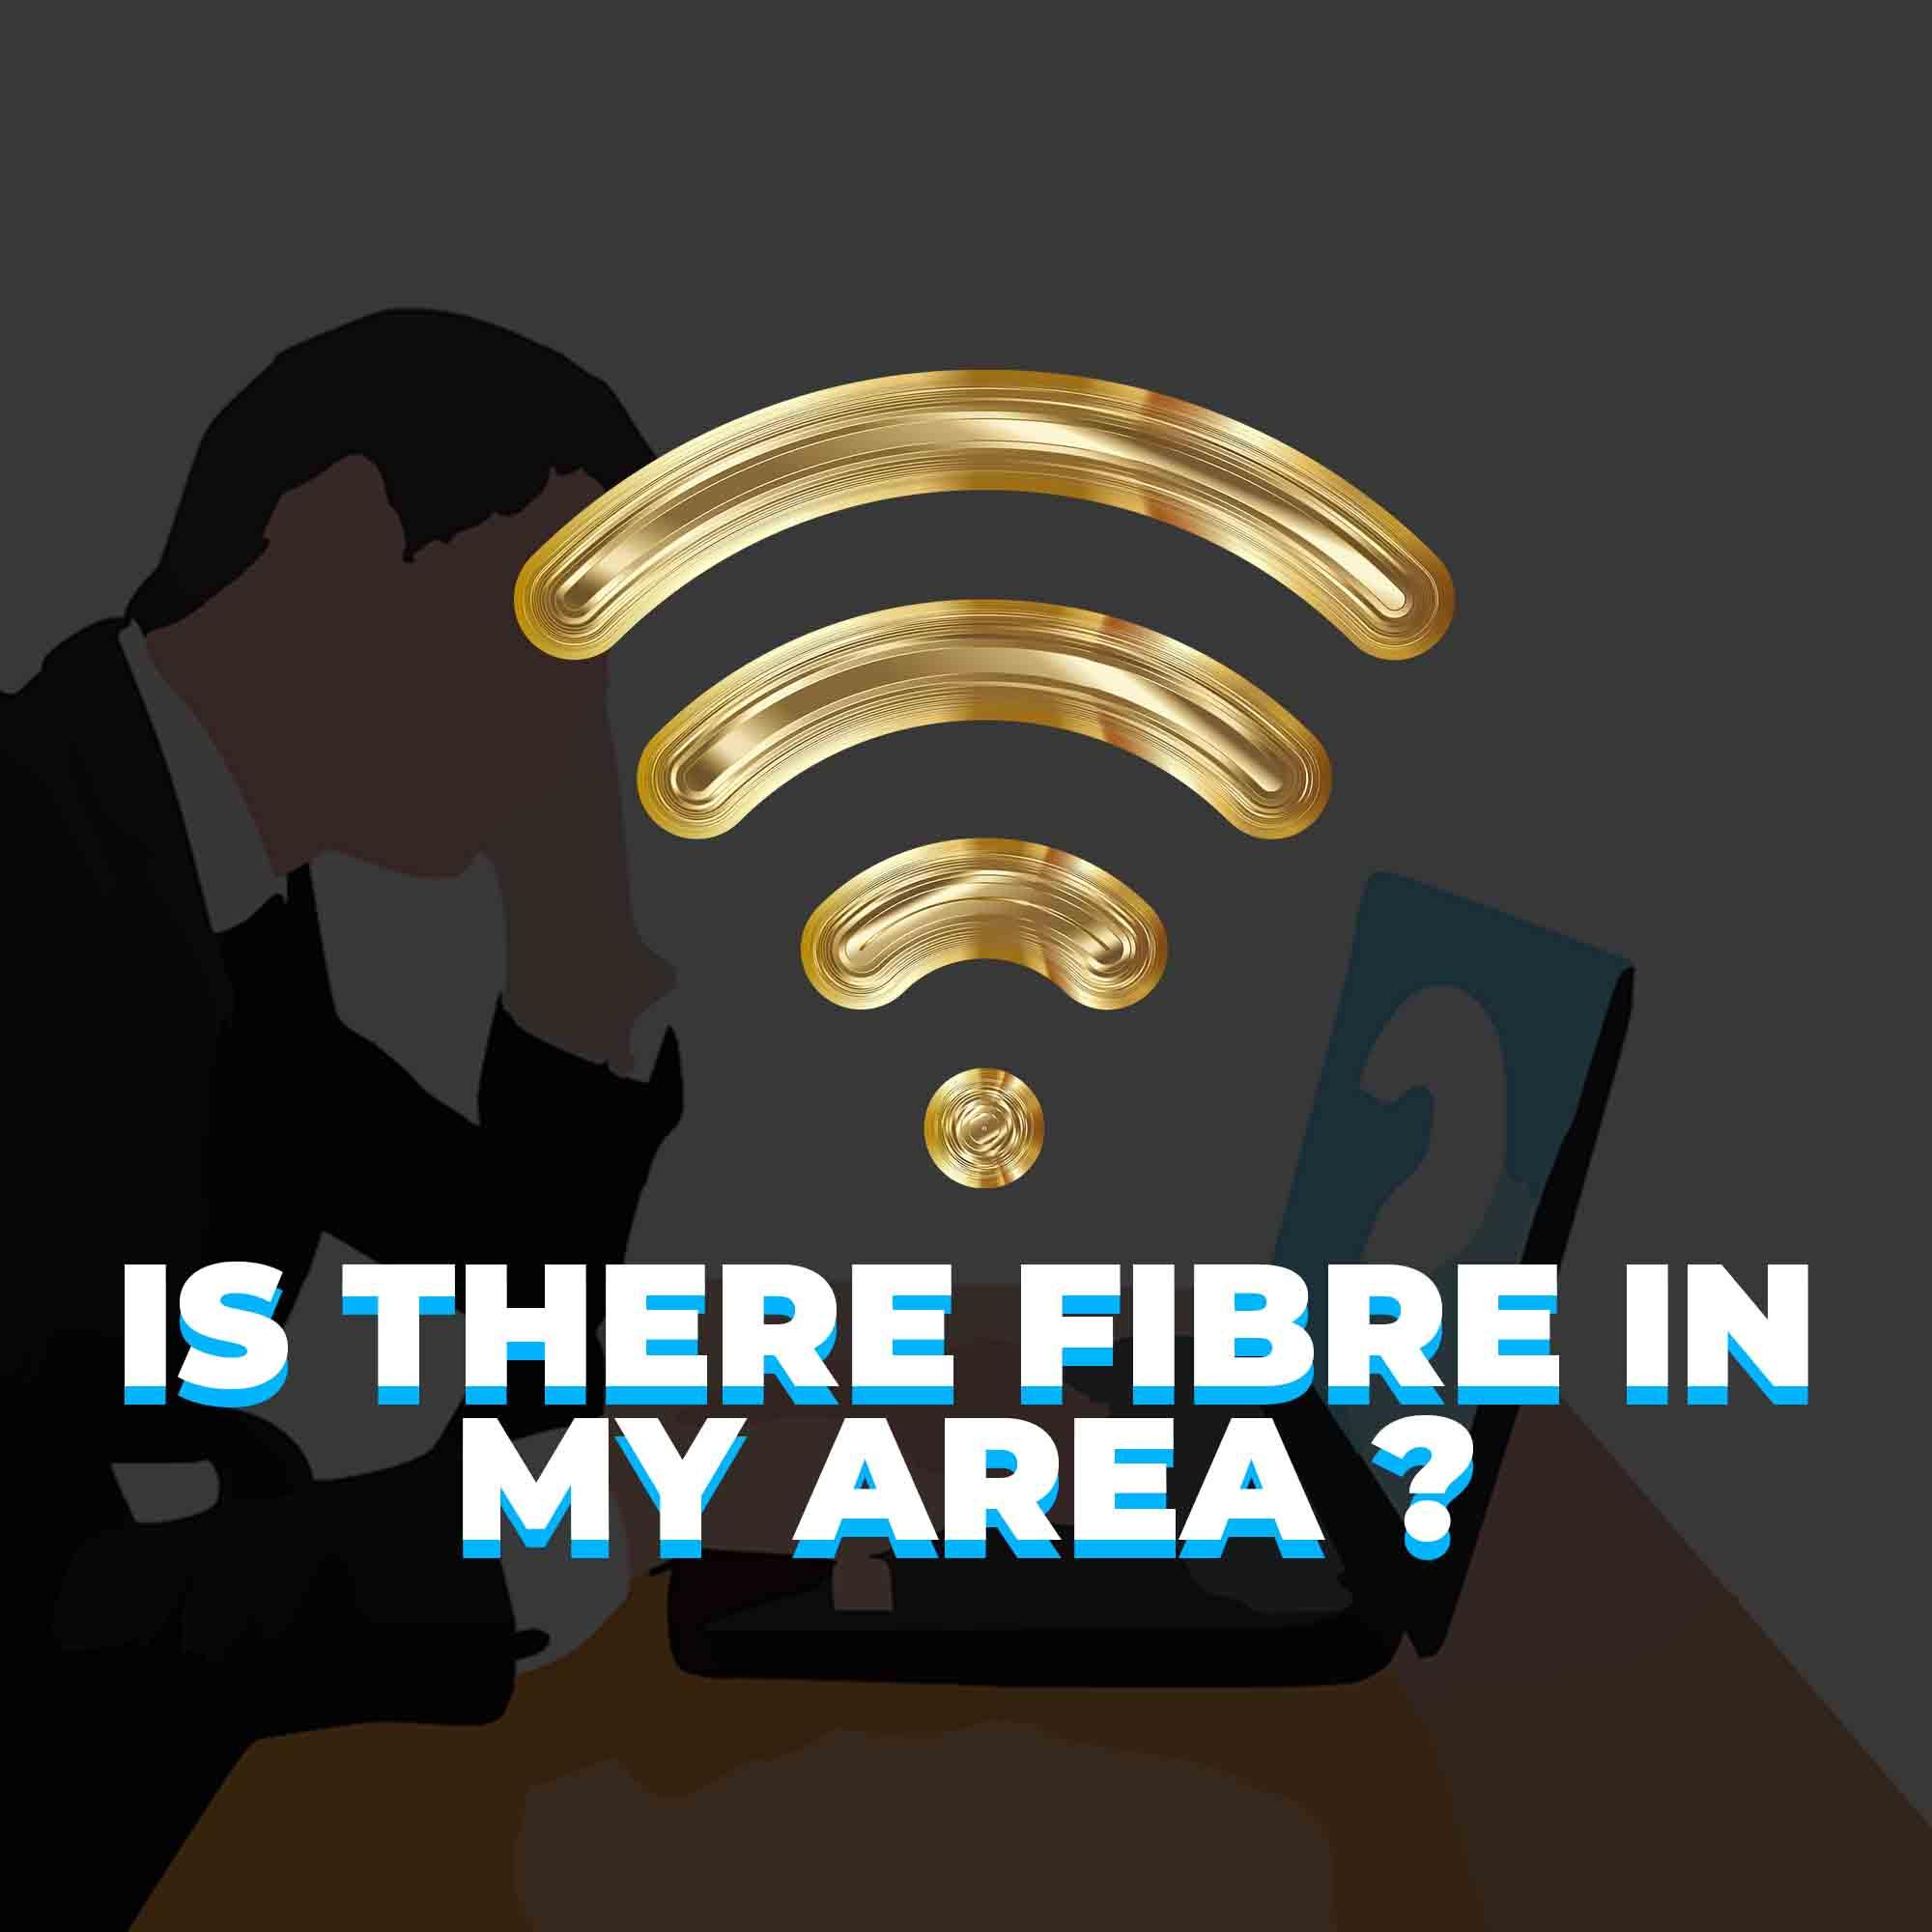 Fibre in my area